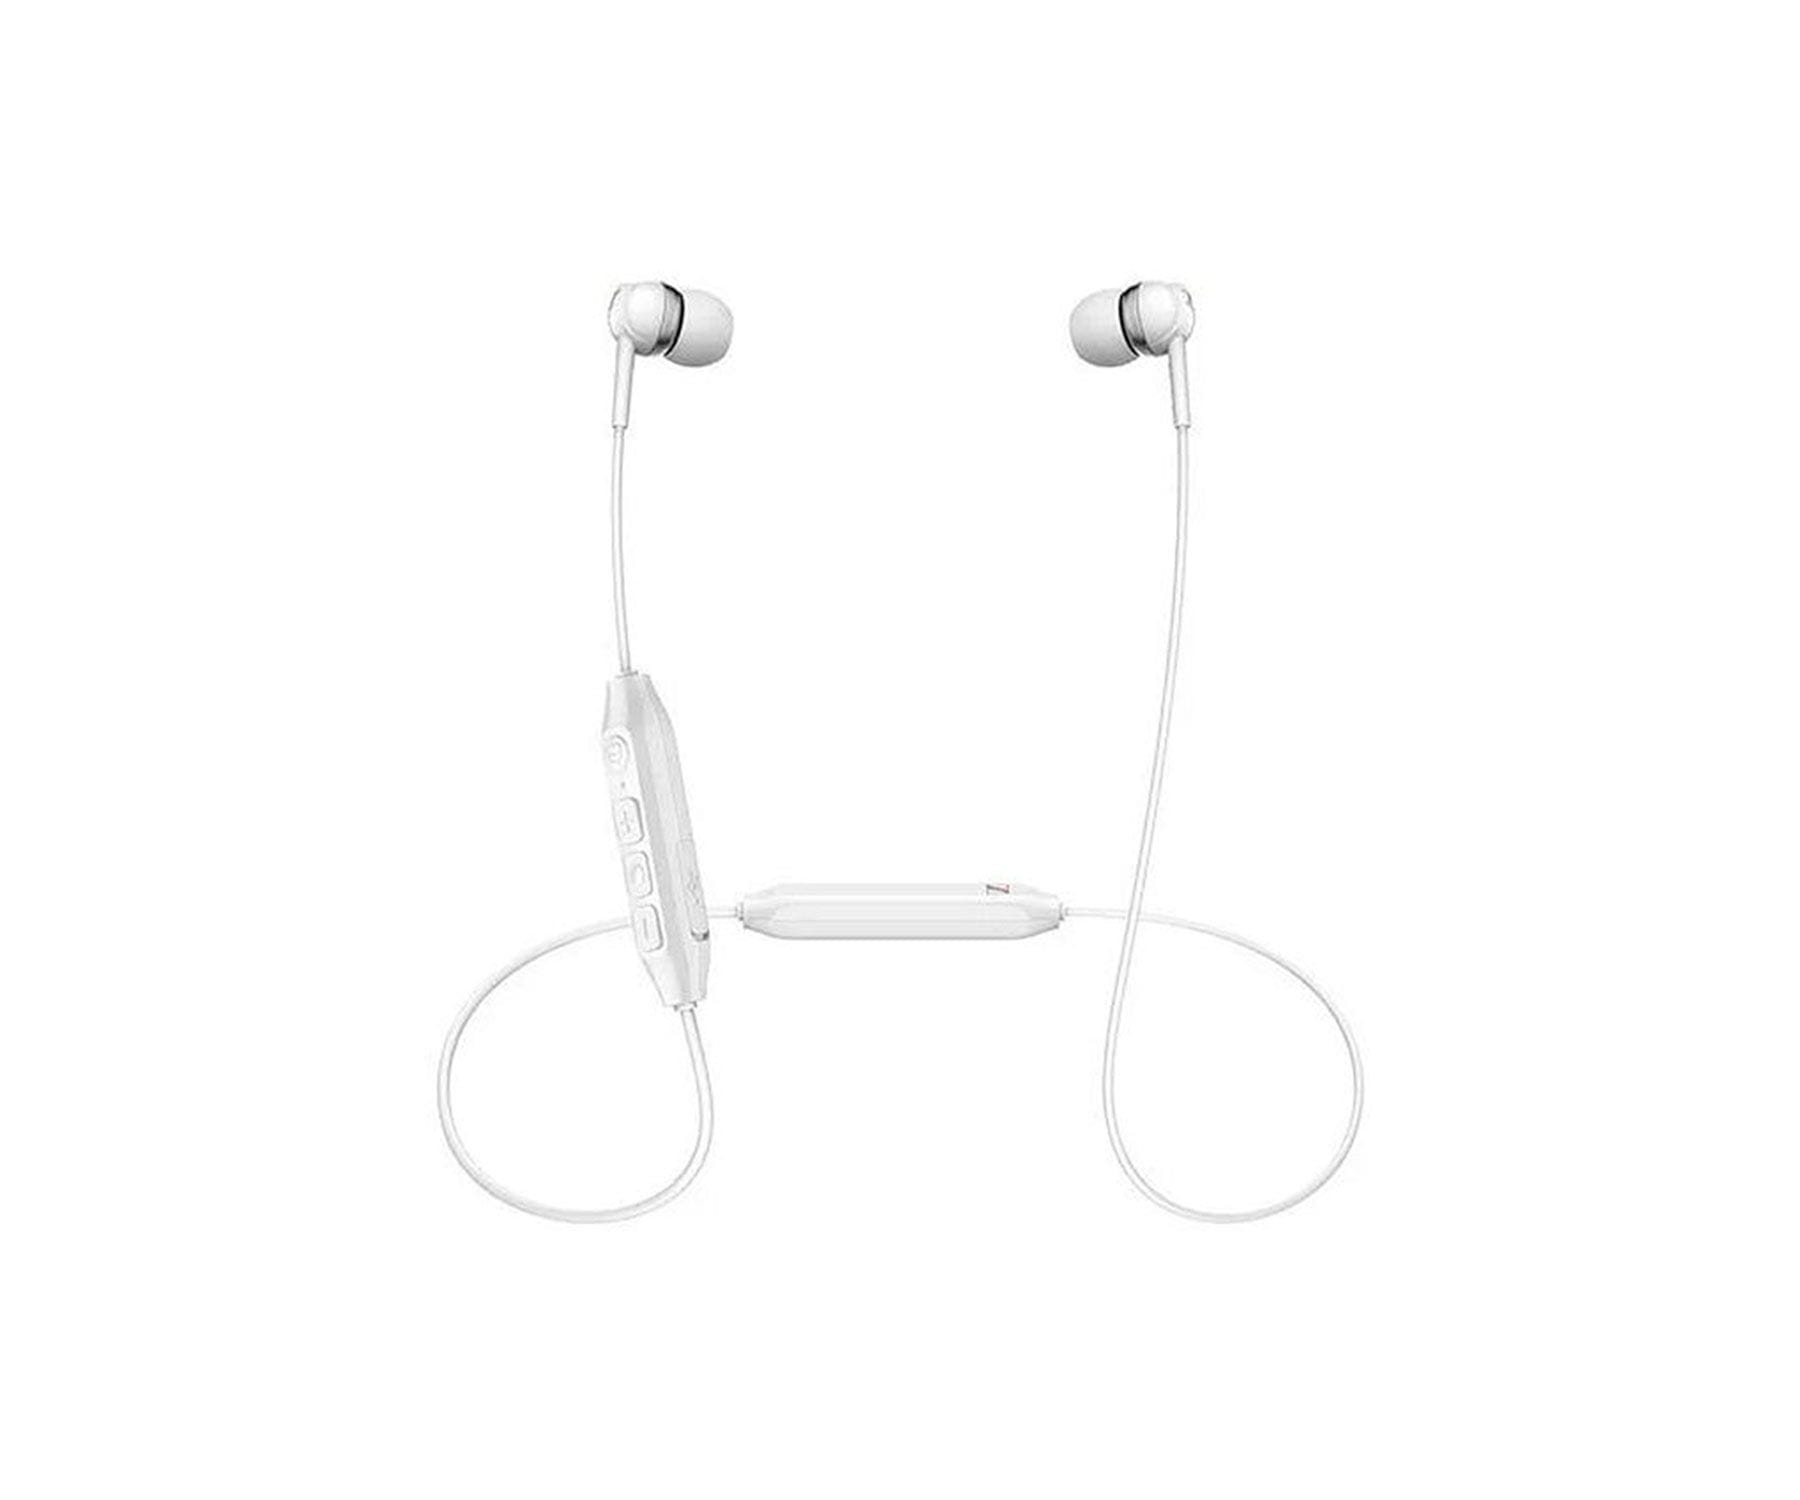 Sennheiser Auriculares CX350BT Blanco/Intraaurales/Bluetooth 5.0